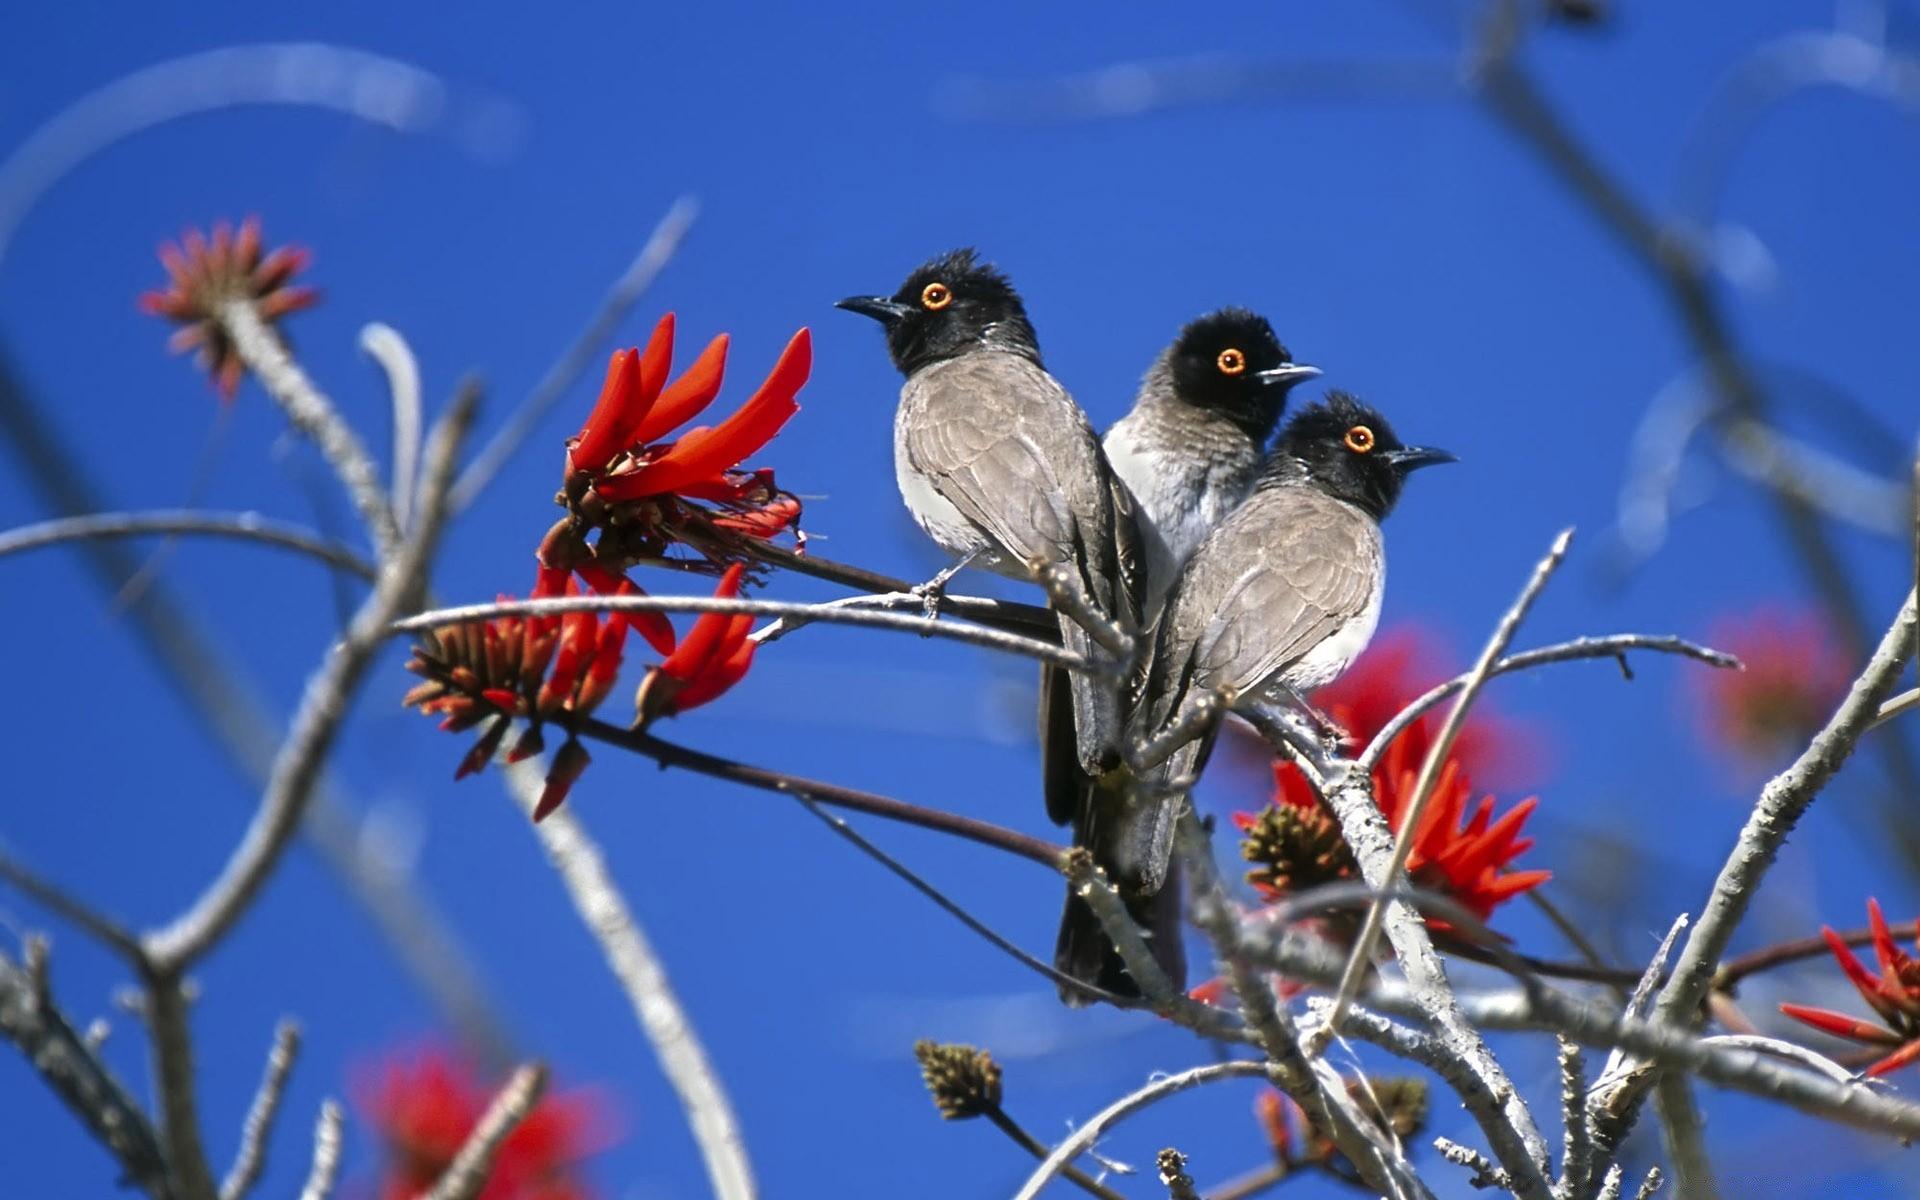 размерами картинки на рабочий стол с птицами убирает